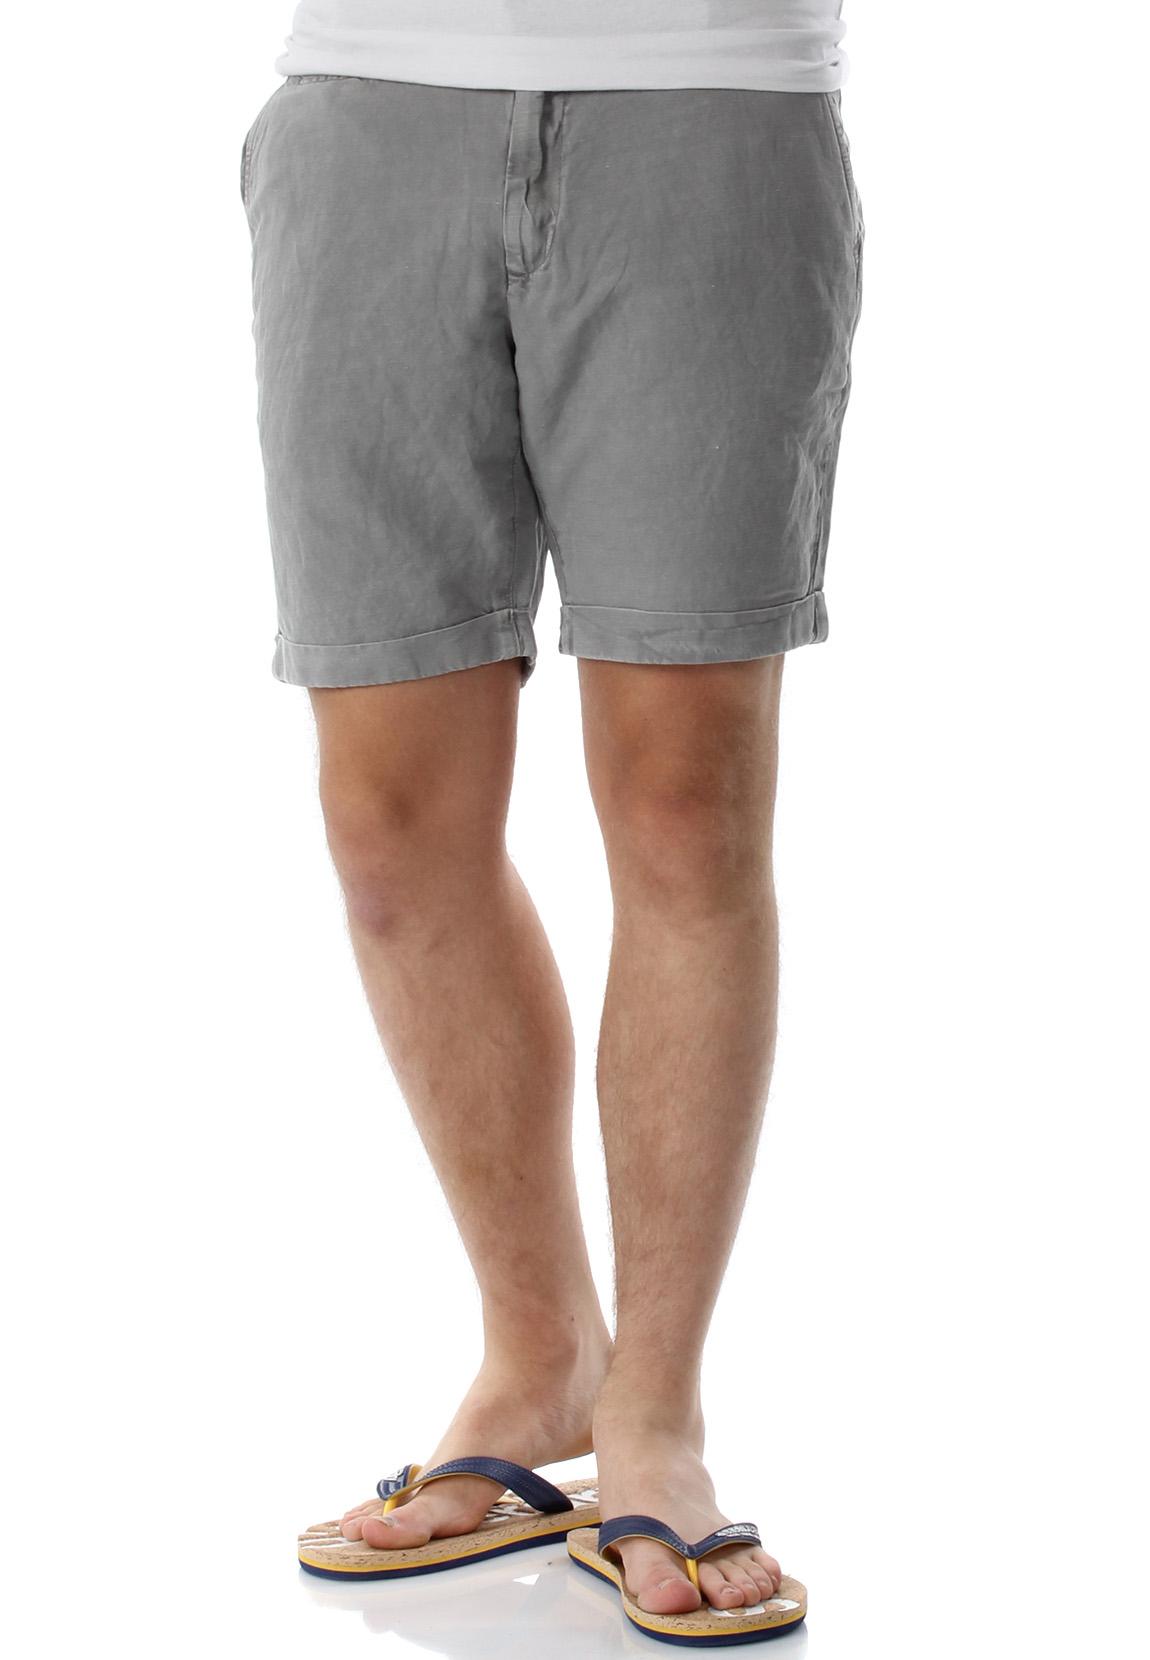 ce0e920fddd377 LTB Shorts Herren ENZO Enzo Quarry Grau Herren Shorts & Jogging